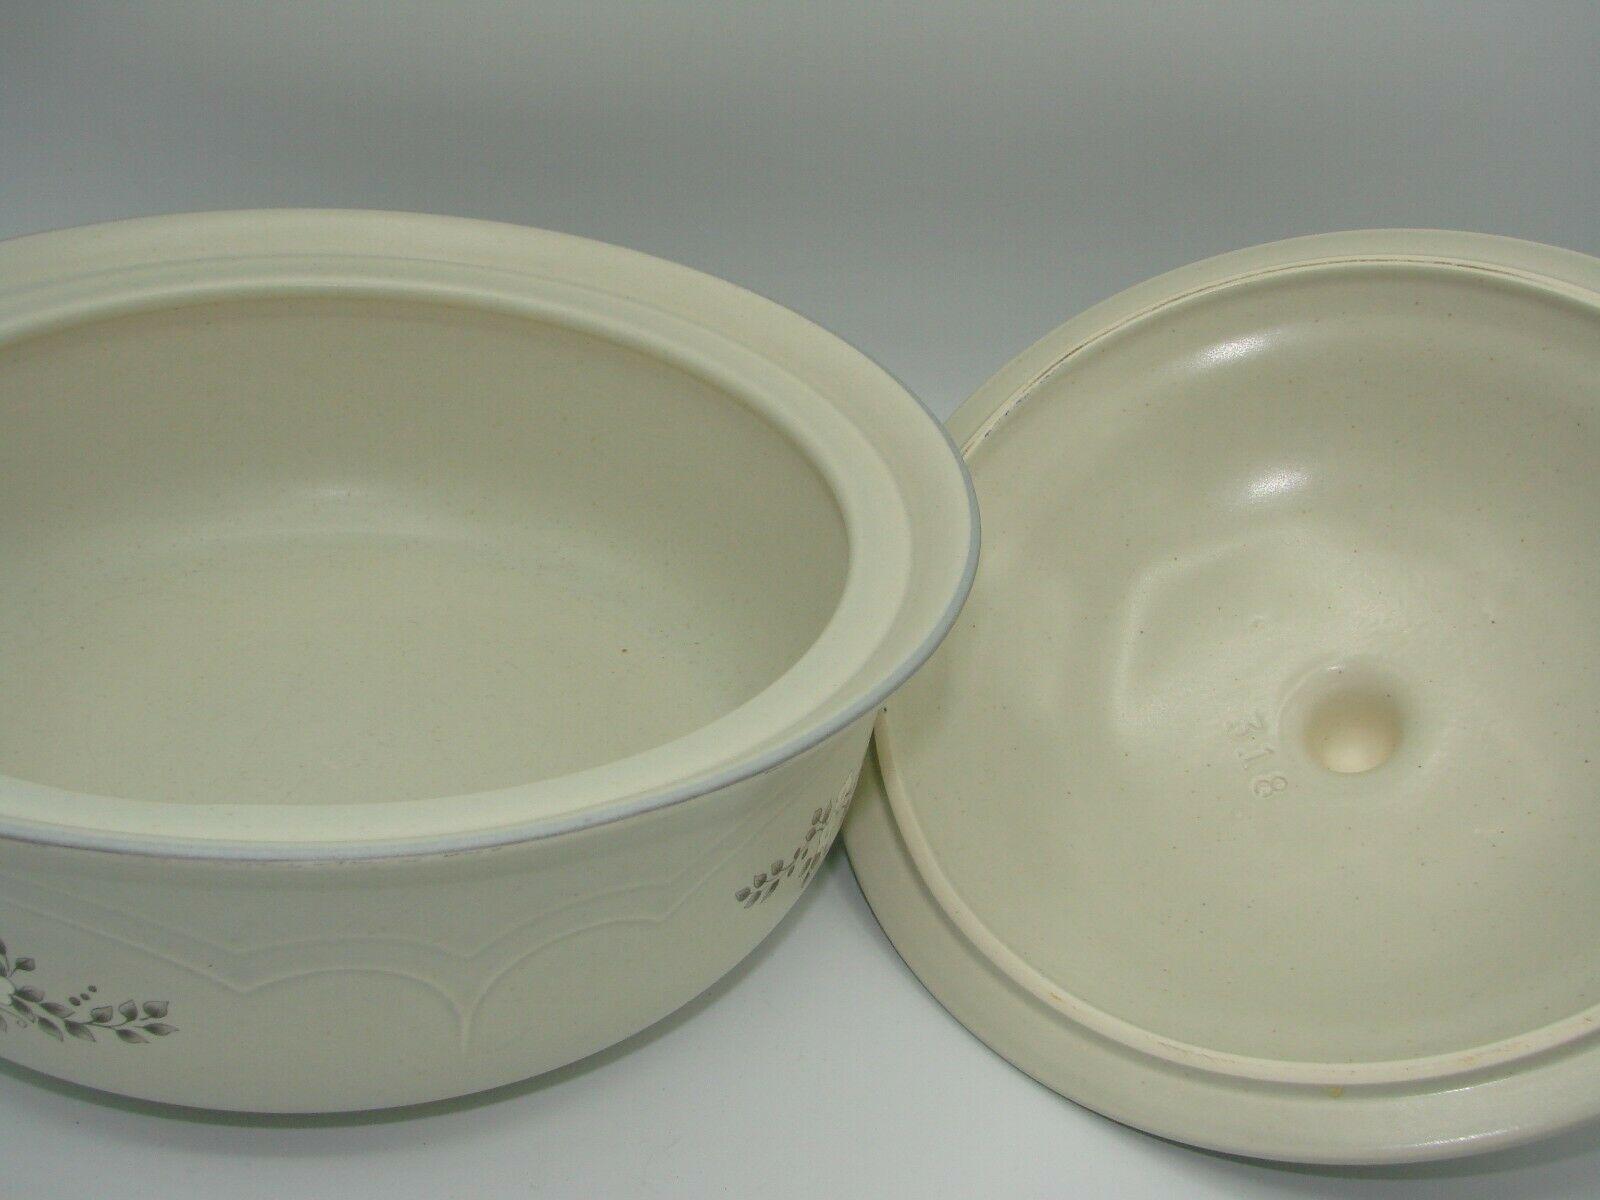 Pristine Pfaltzgraff Heirloom Covered Casserole Dish 8.75 2 Quart White Flowers image 4